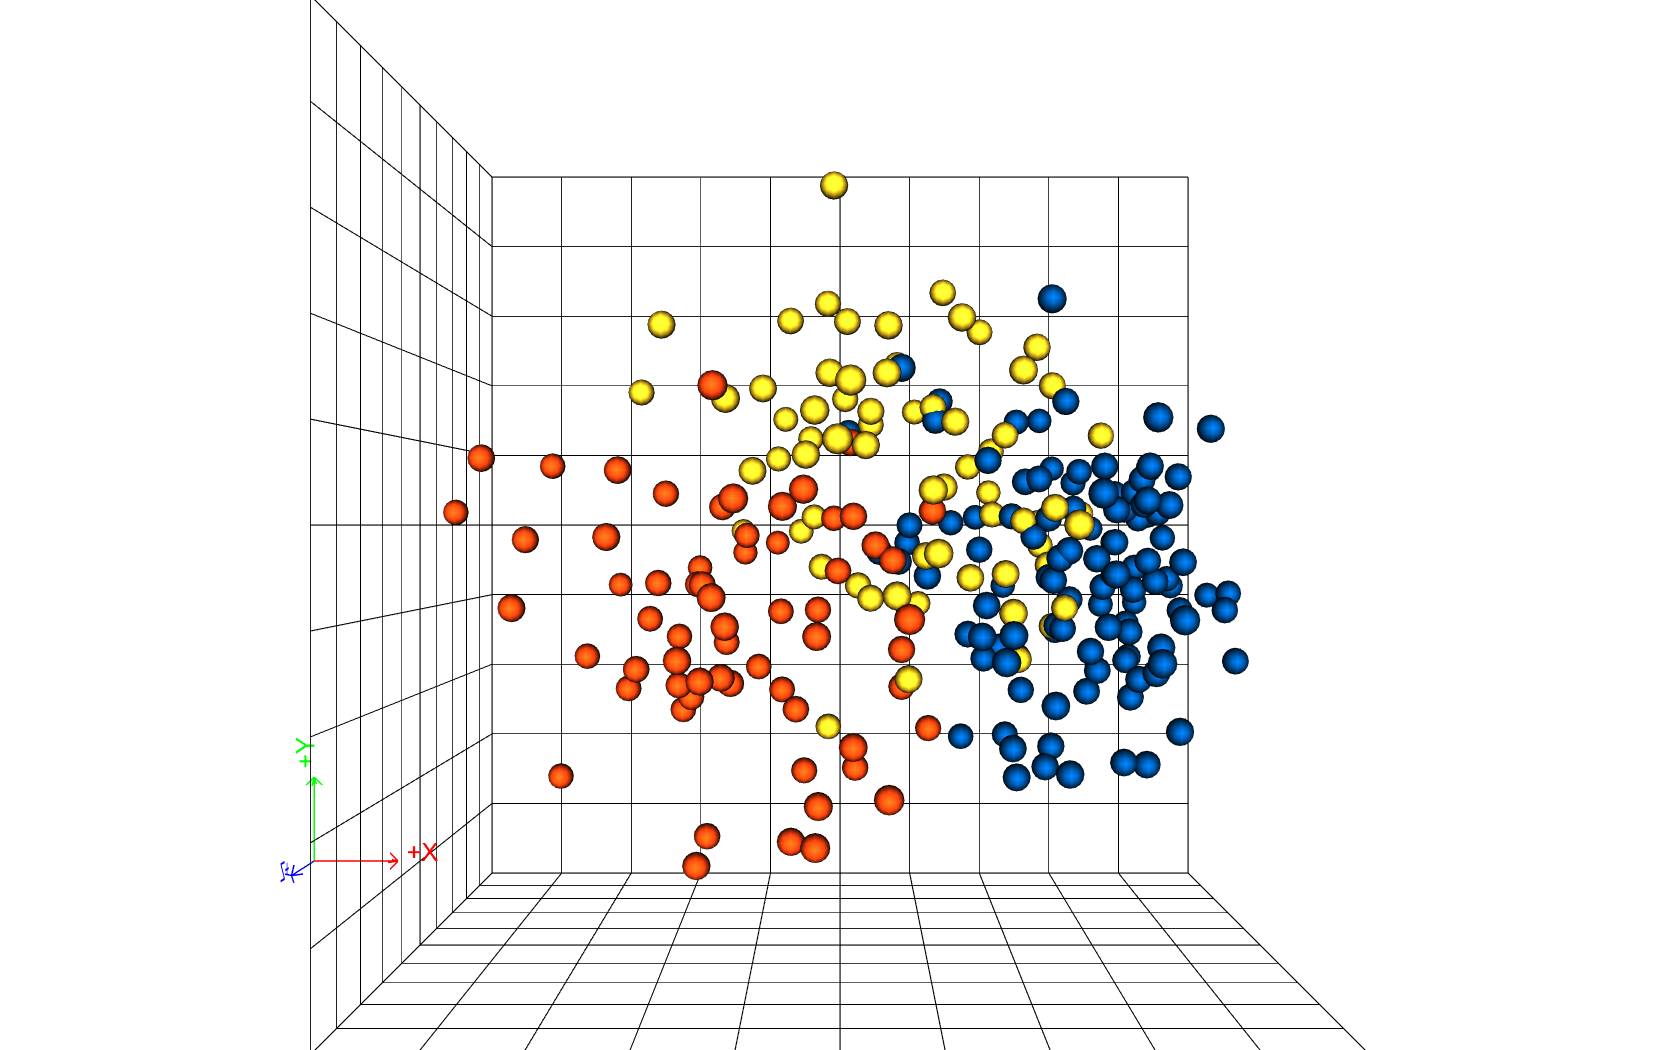 PELATIHAN Financial Modeling Fundamental with Sensitivity Analysis and Xcelcius (using Excel, VBA & Xcelcius)